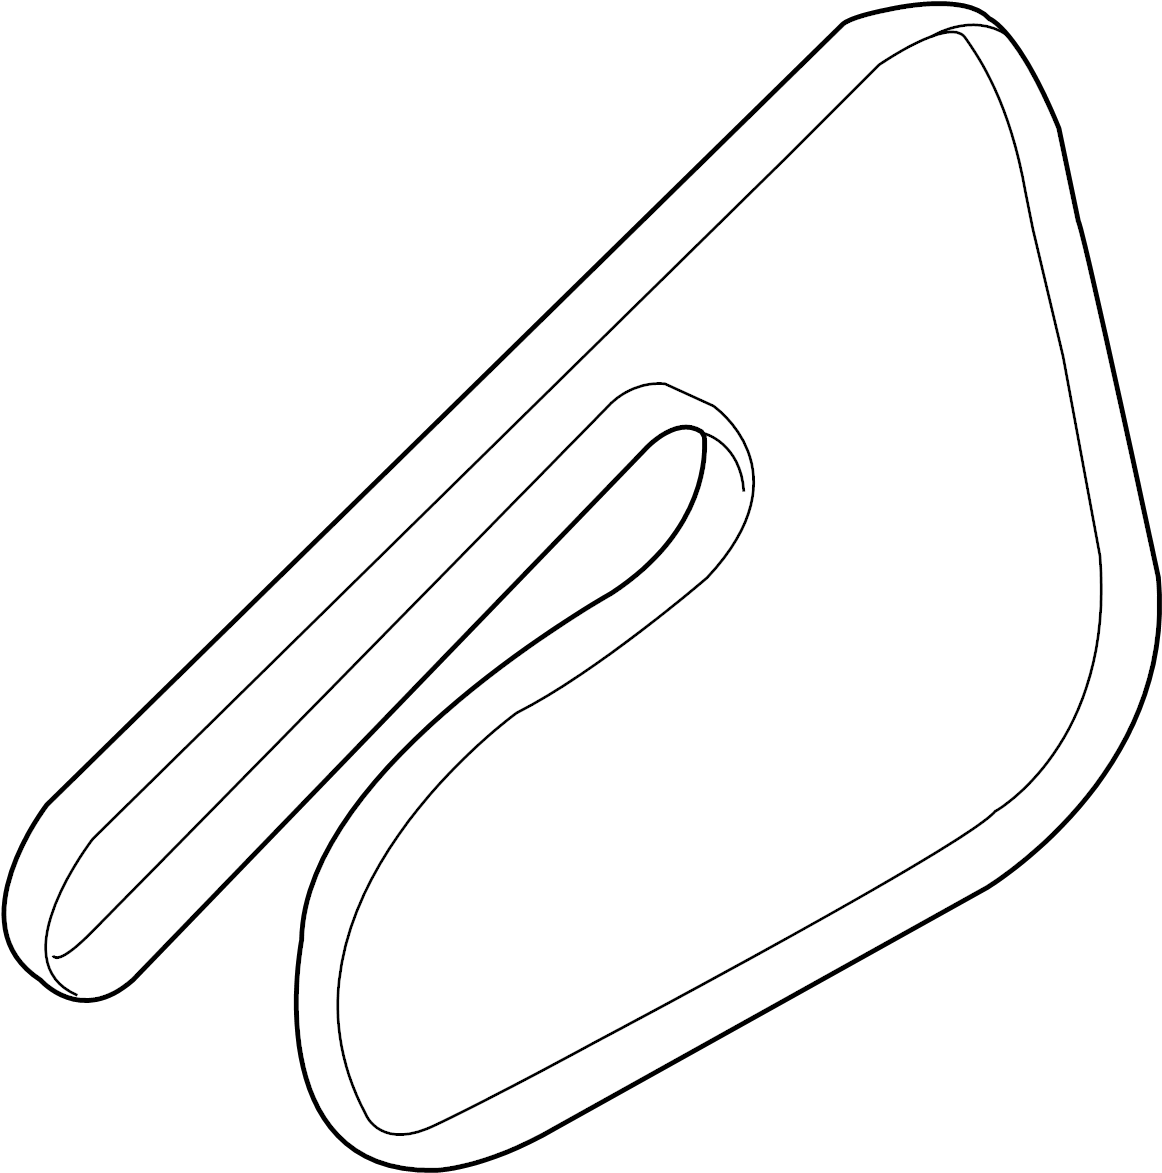 Chevrolet Silverado Hd Belt Serpentine Belt 11